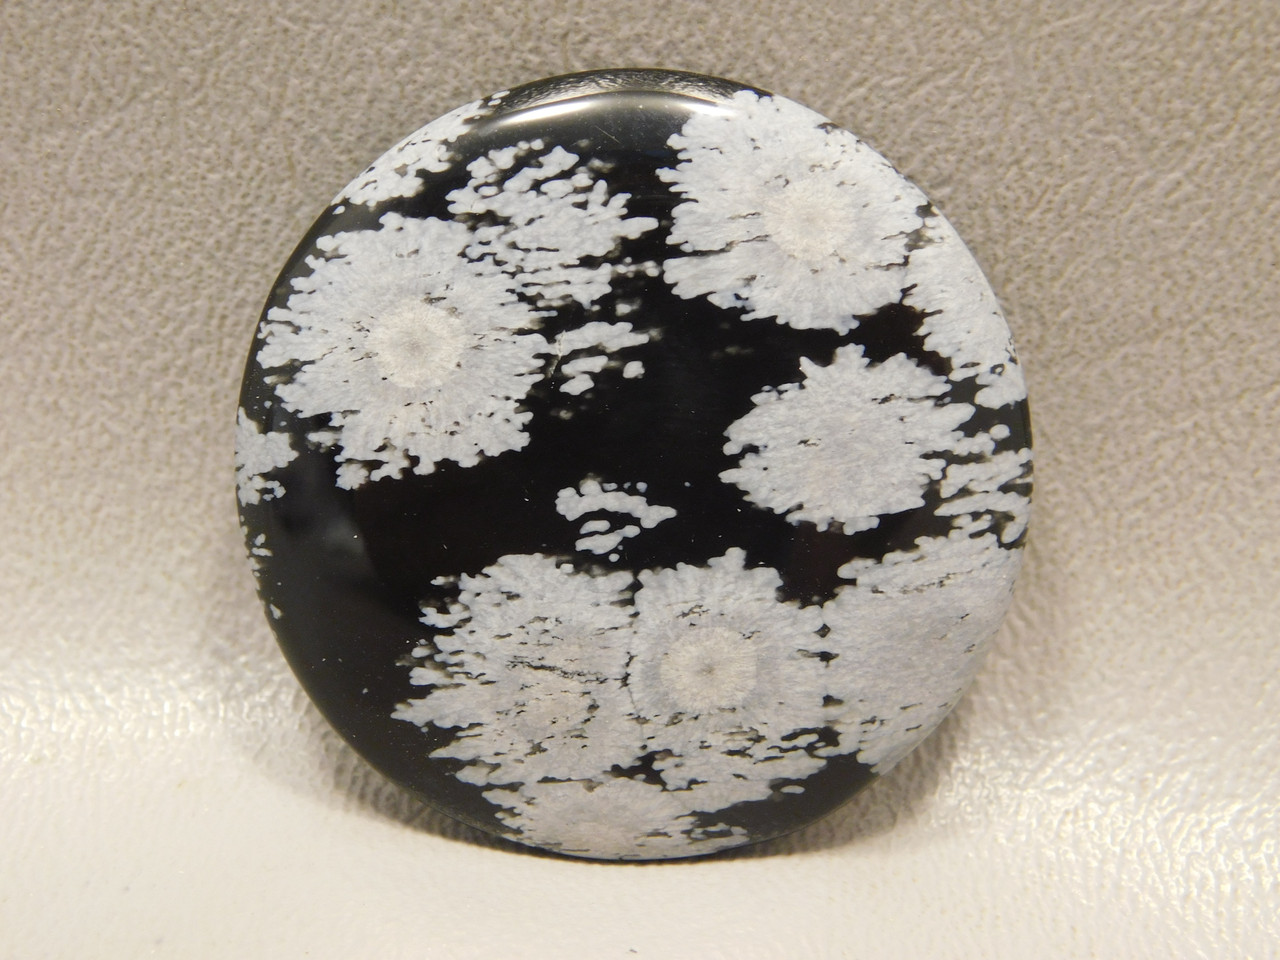 Snowflake Obsidian Cabochon 39 mm Round Stone #6